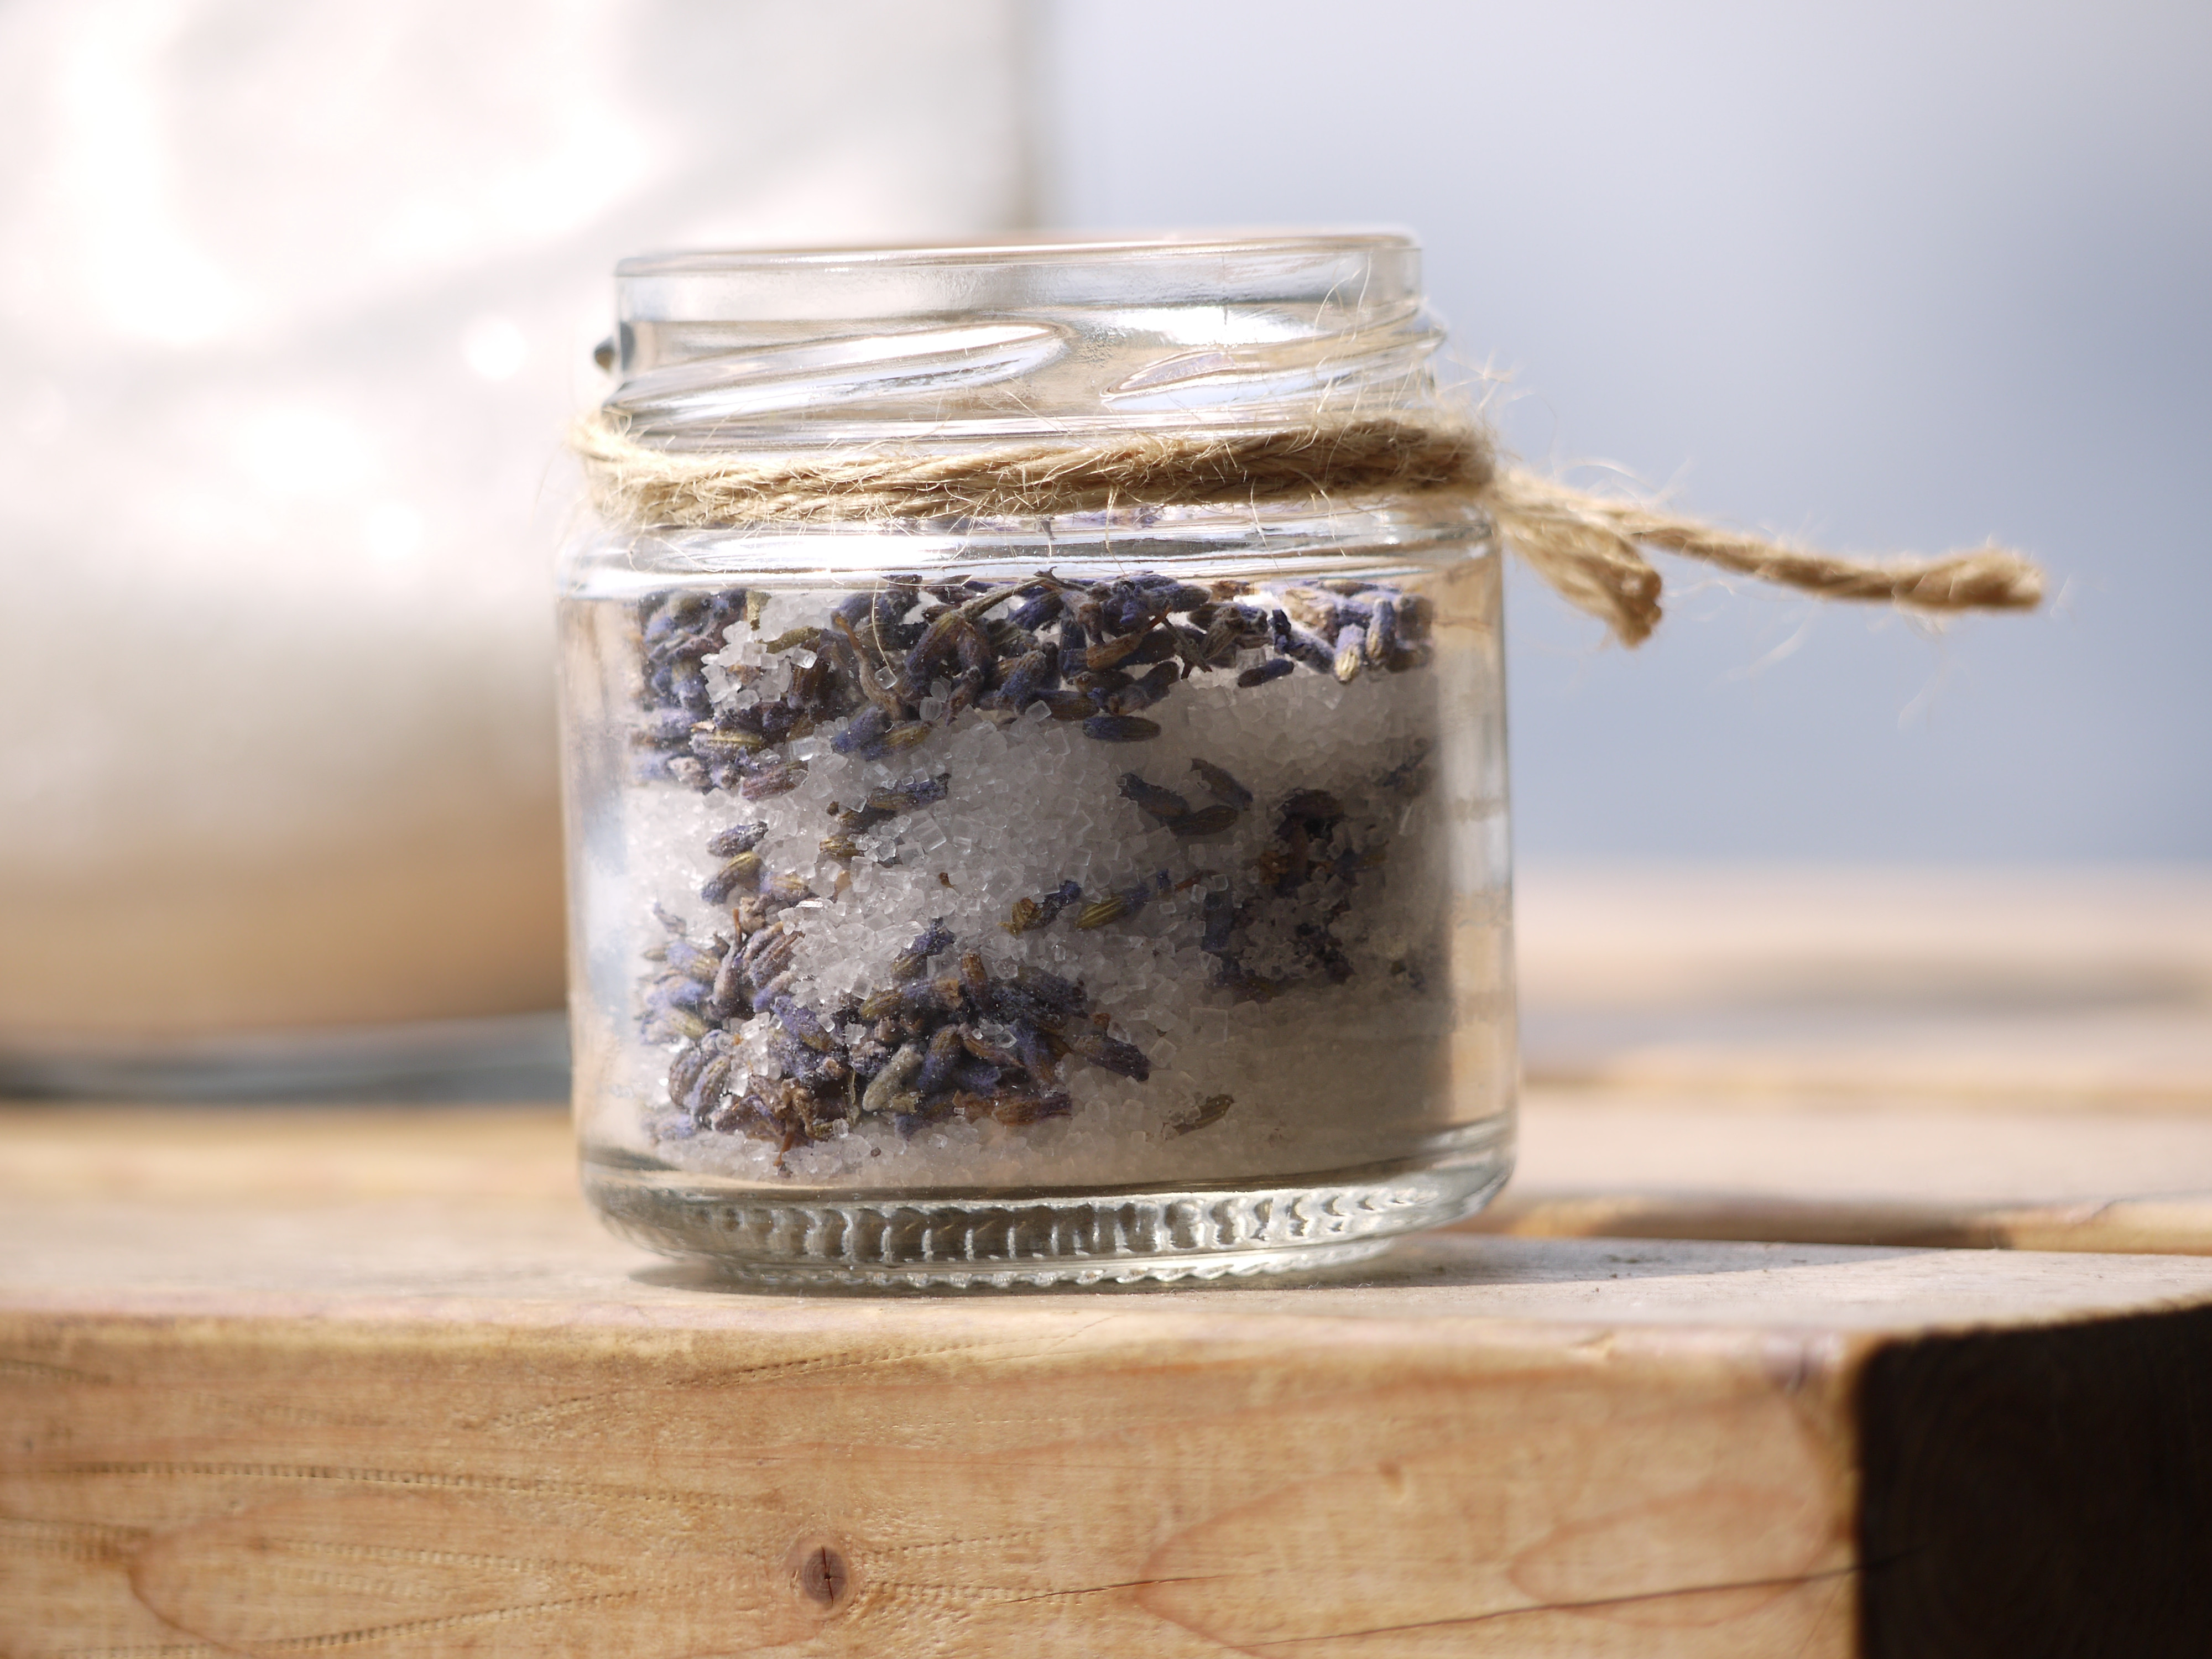 薰衣草糖 Lavender Sugar